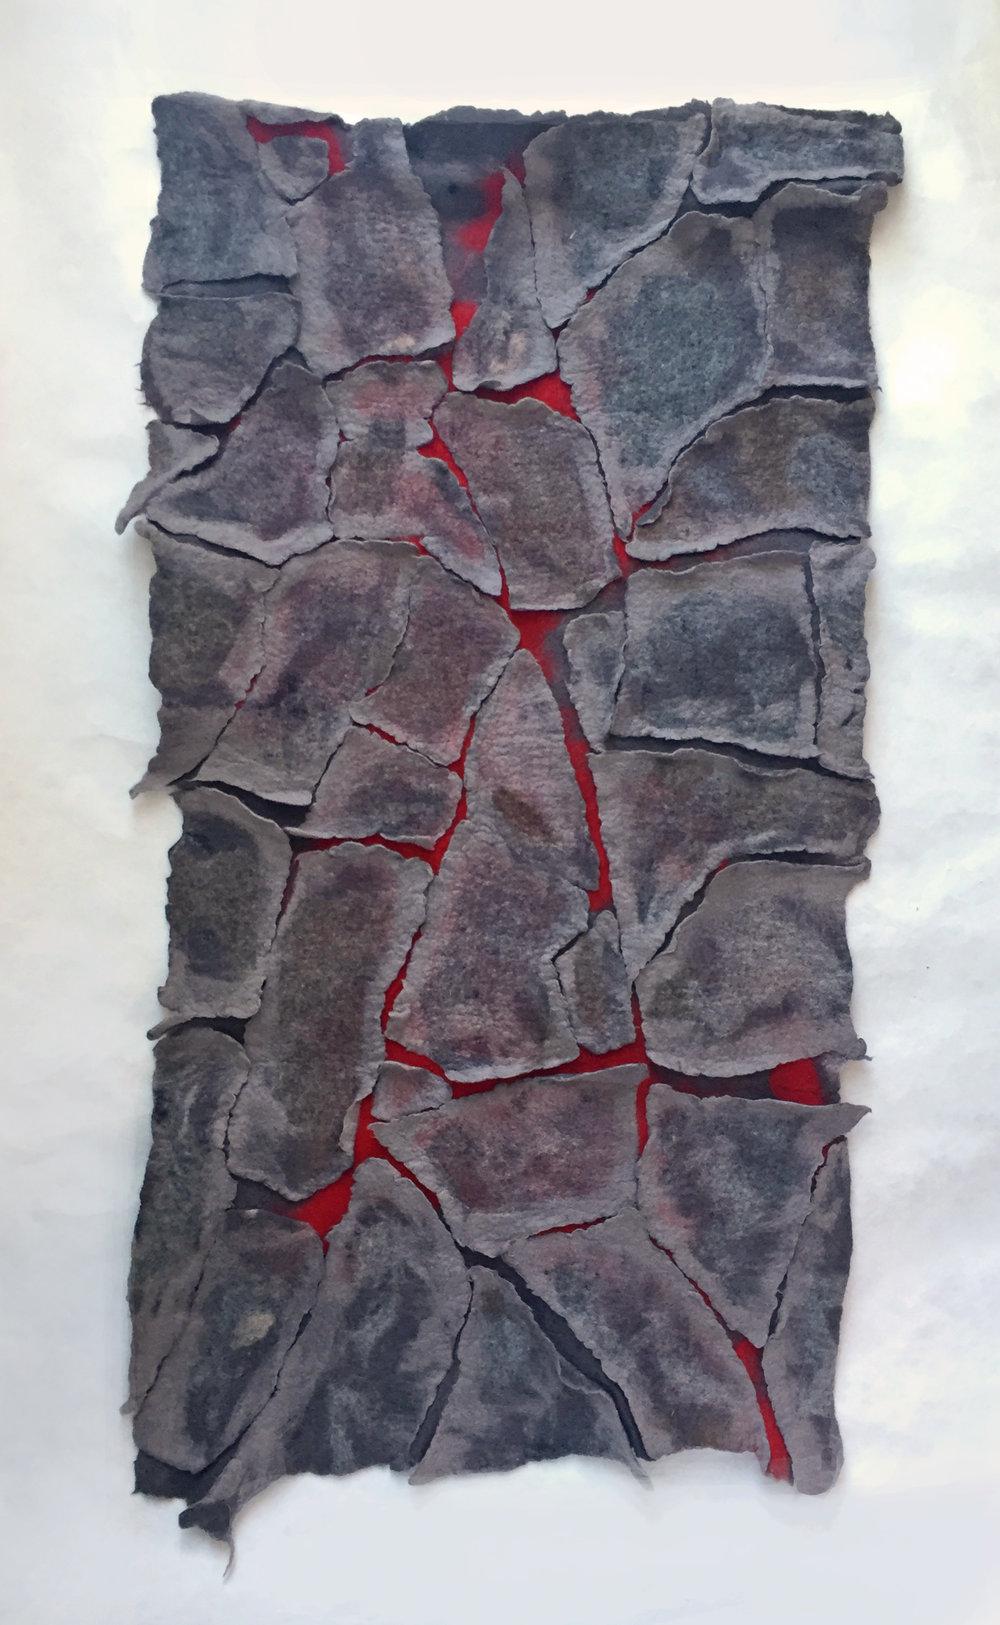 Cracked Lava